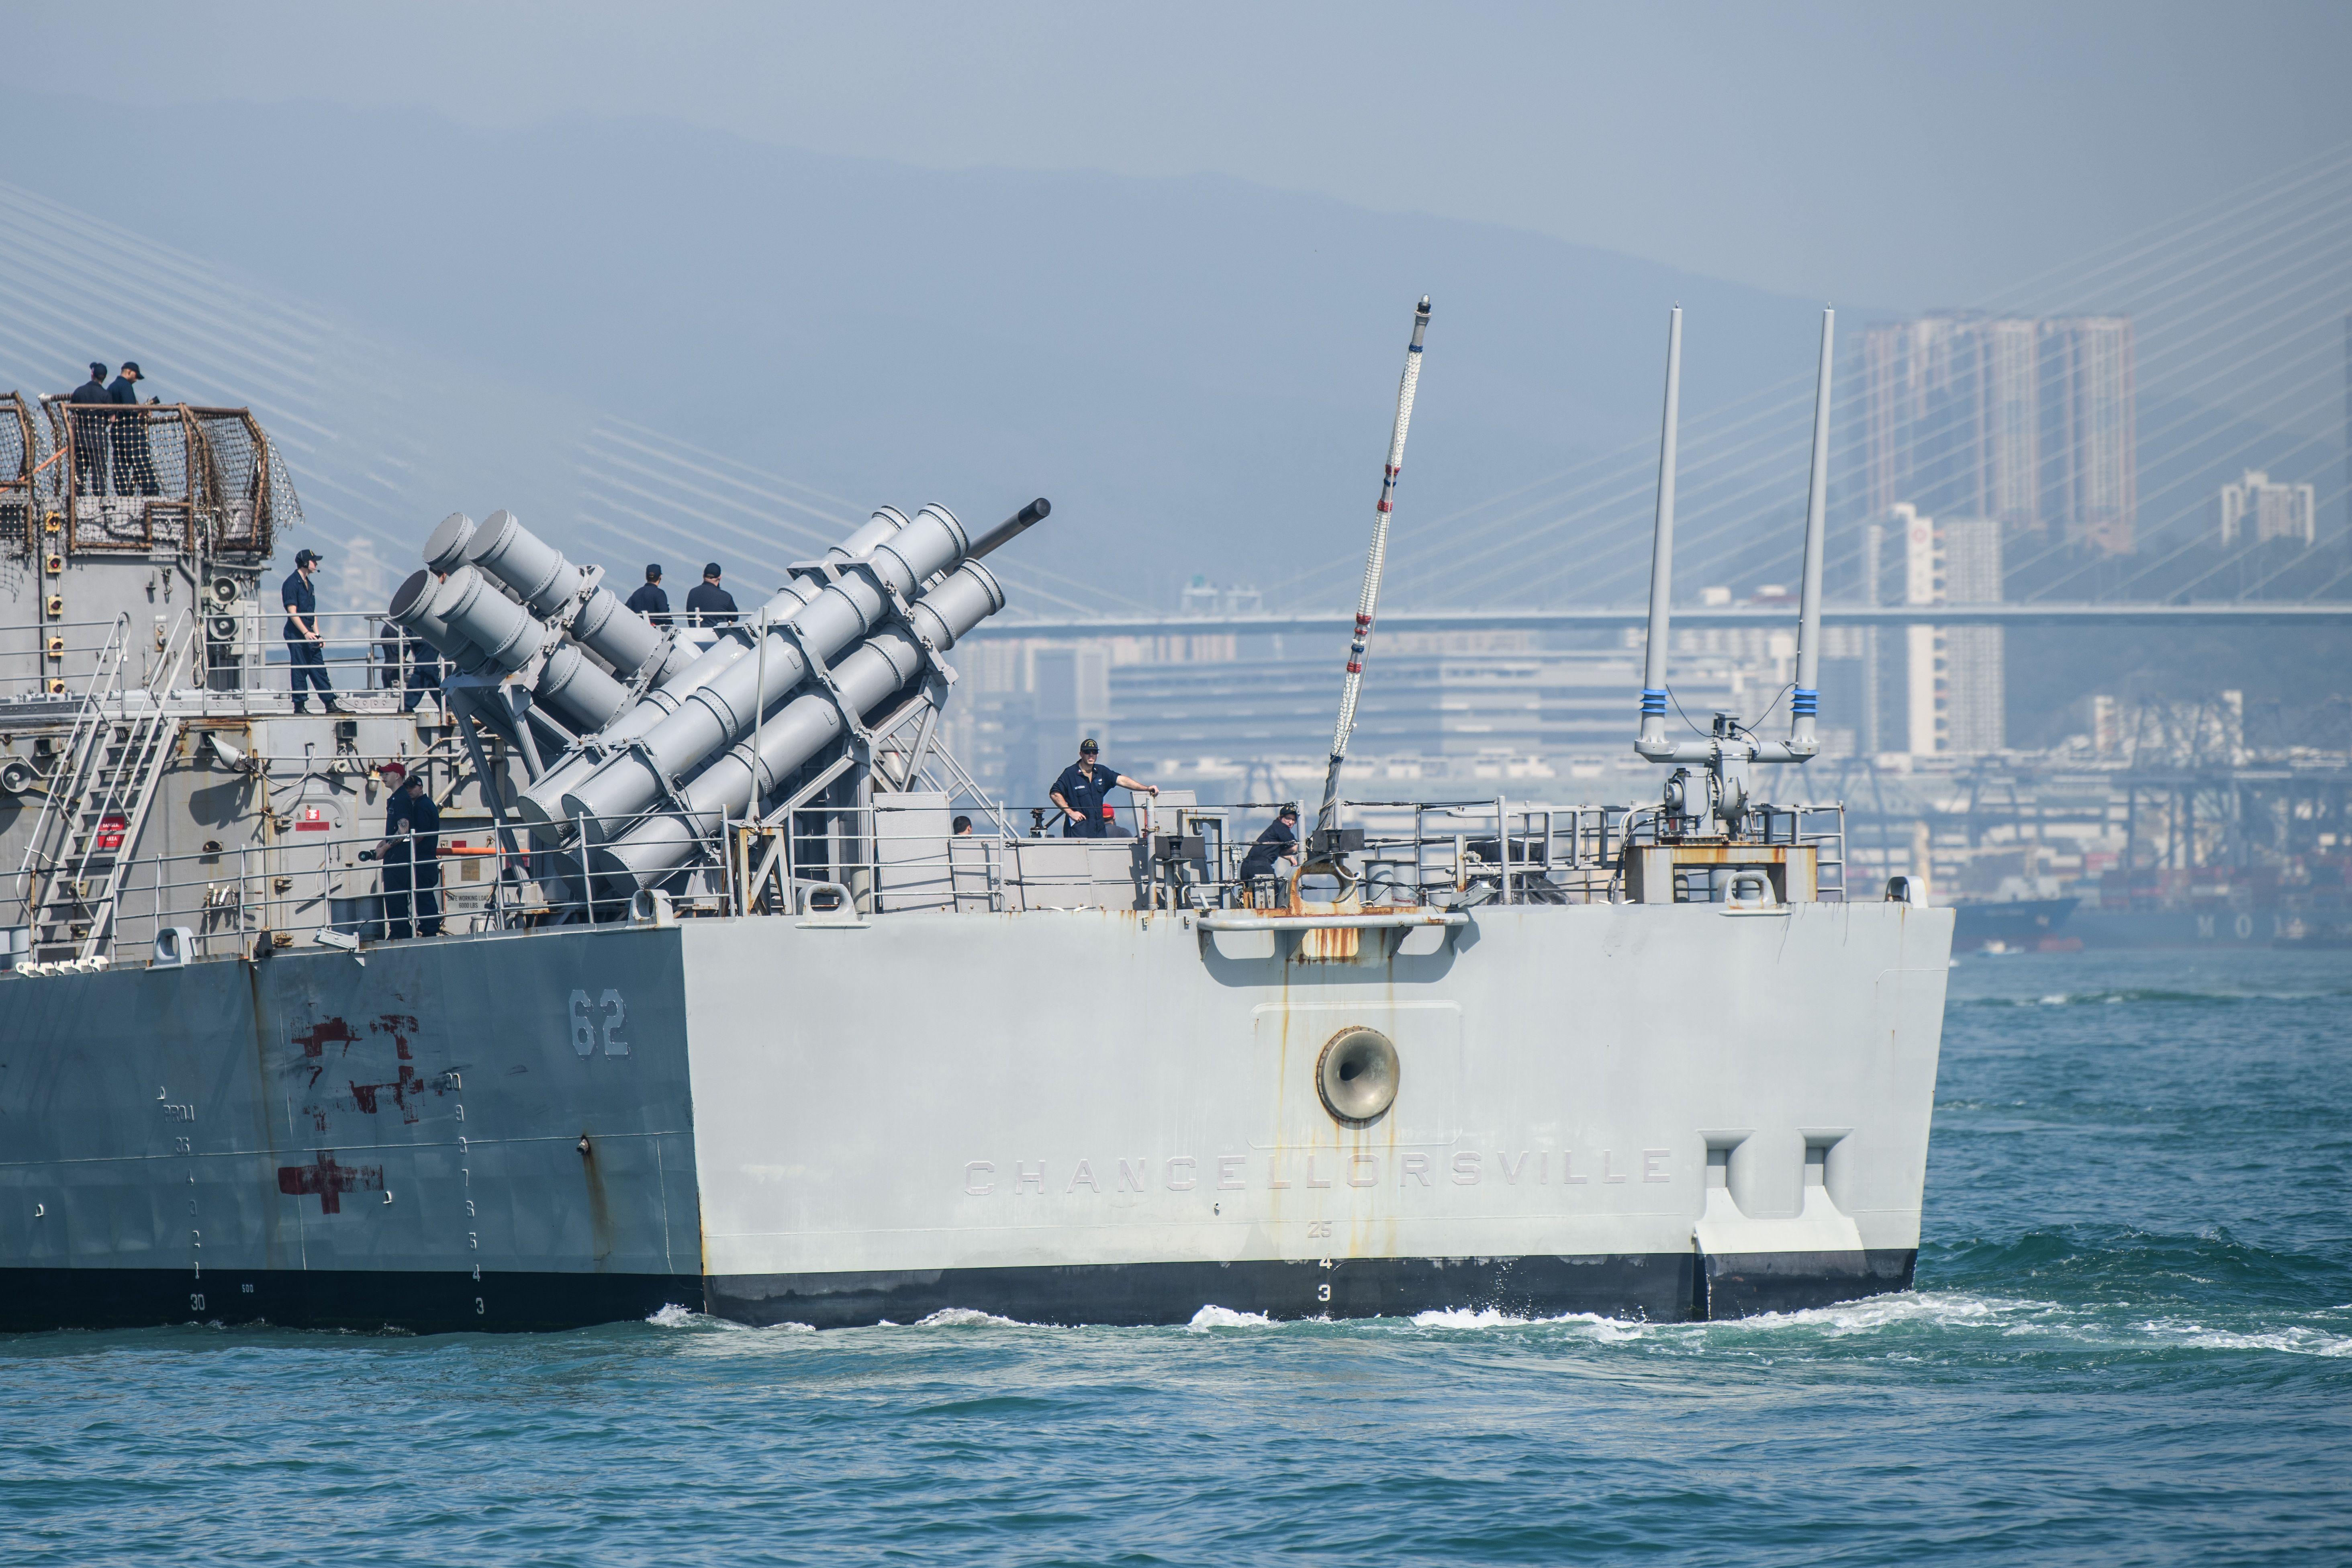 2018年11月21日,在香港外海的美軍導彈巡洋艦錢瑟勒斯維爾號(USS Chancellorsville)。(ANTHONY WALLACE/AFP/Getty Images)